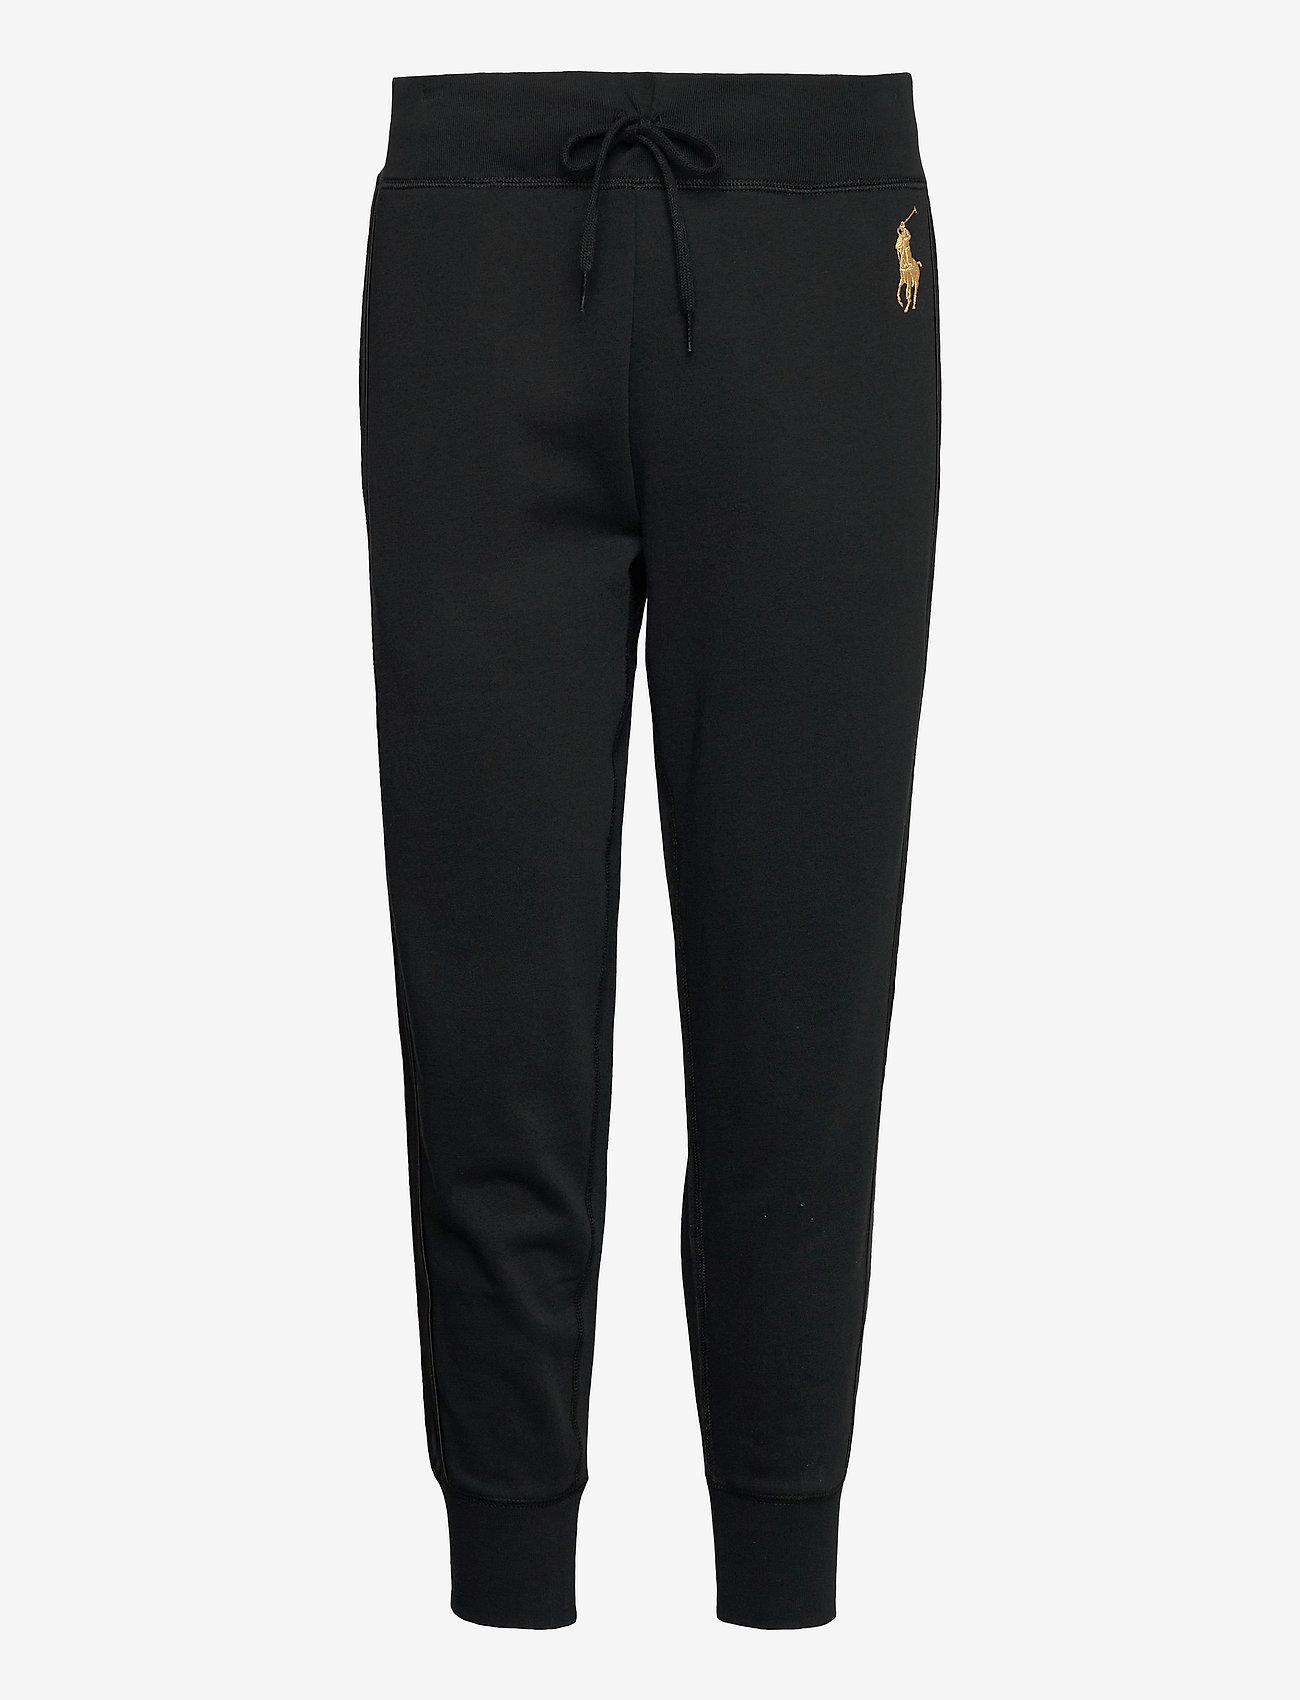 Polo Ralph Lauren - Lunar New Year Sweatpant - sweatpants - polo black - 0